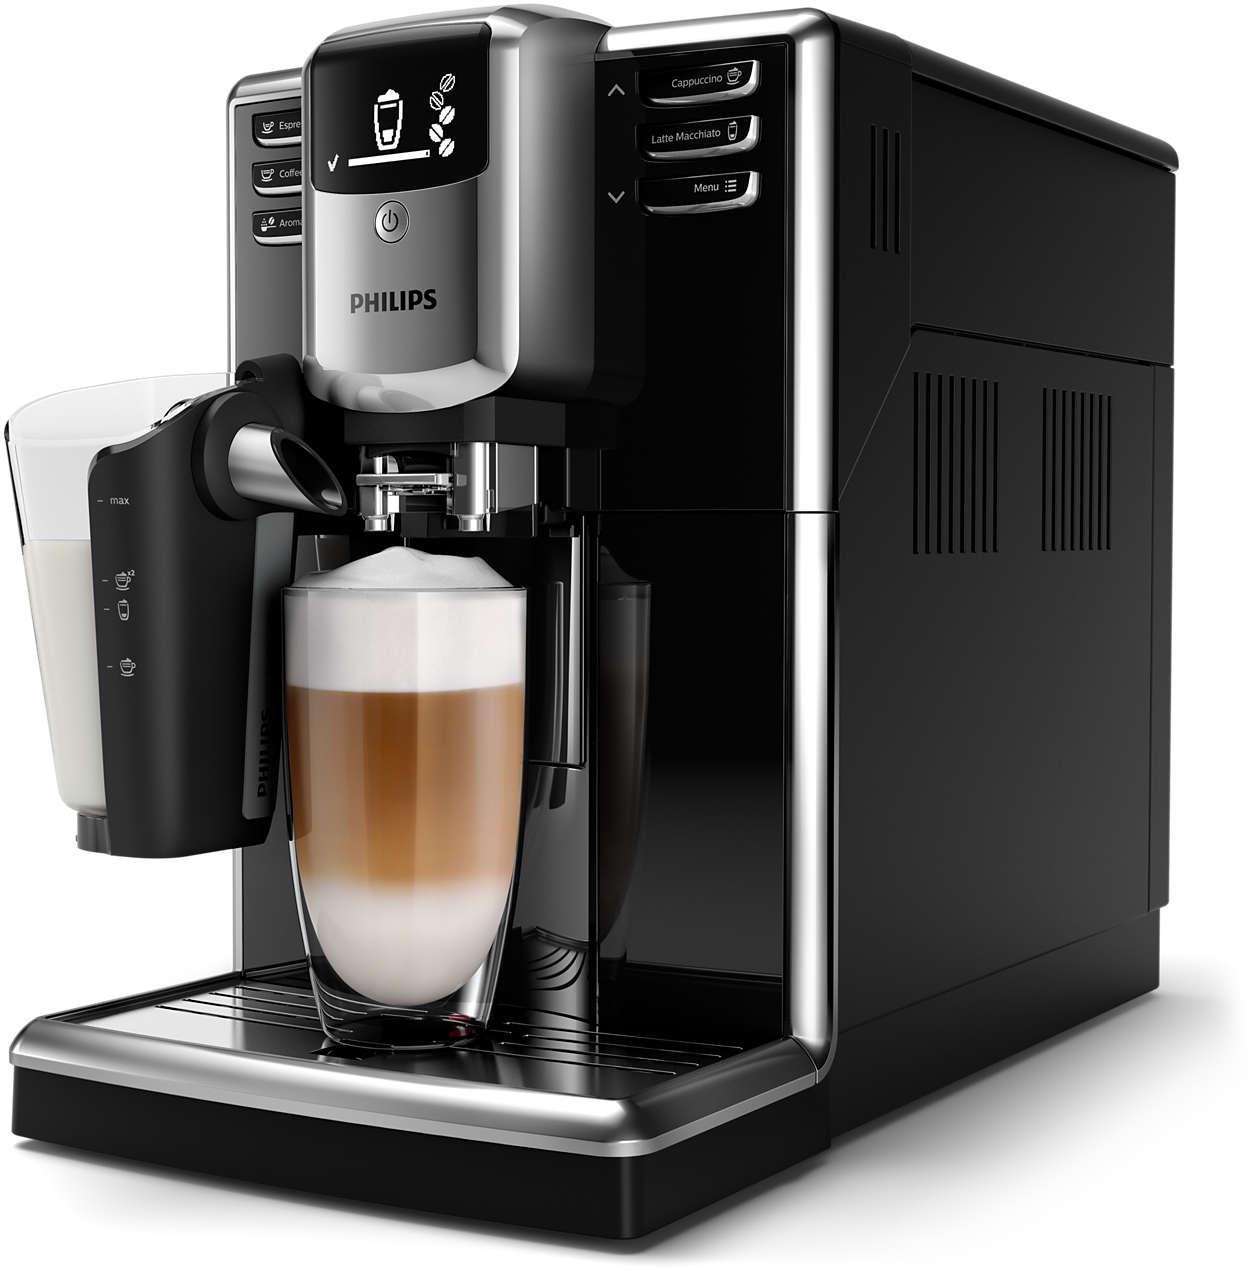 Philips EP5340 volautomatische espressomachine